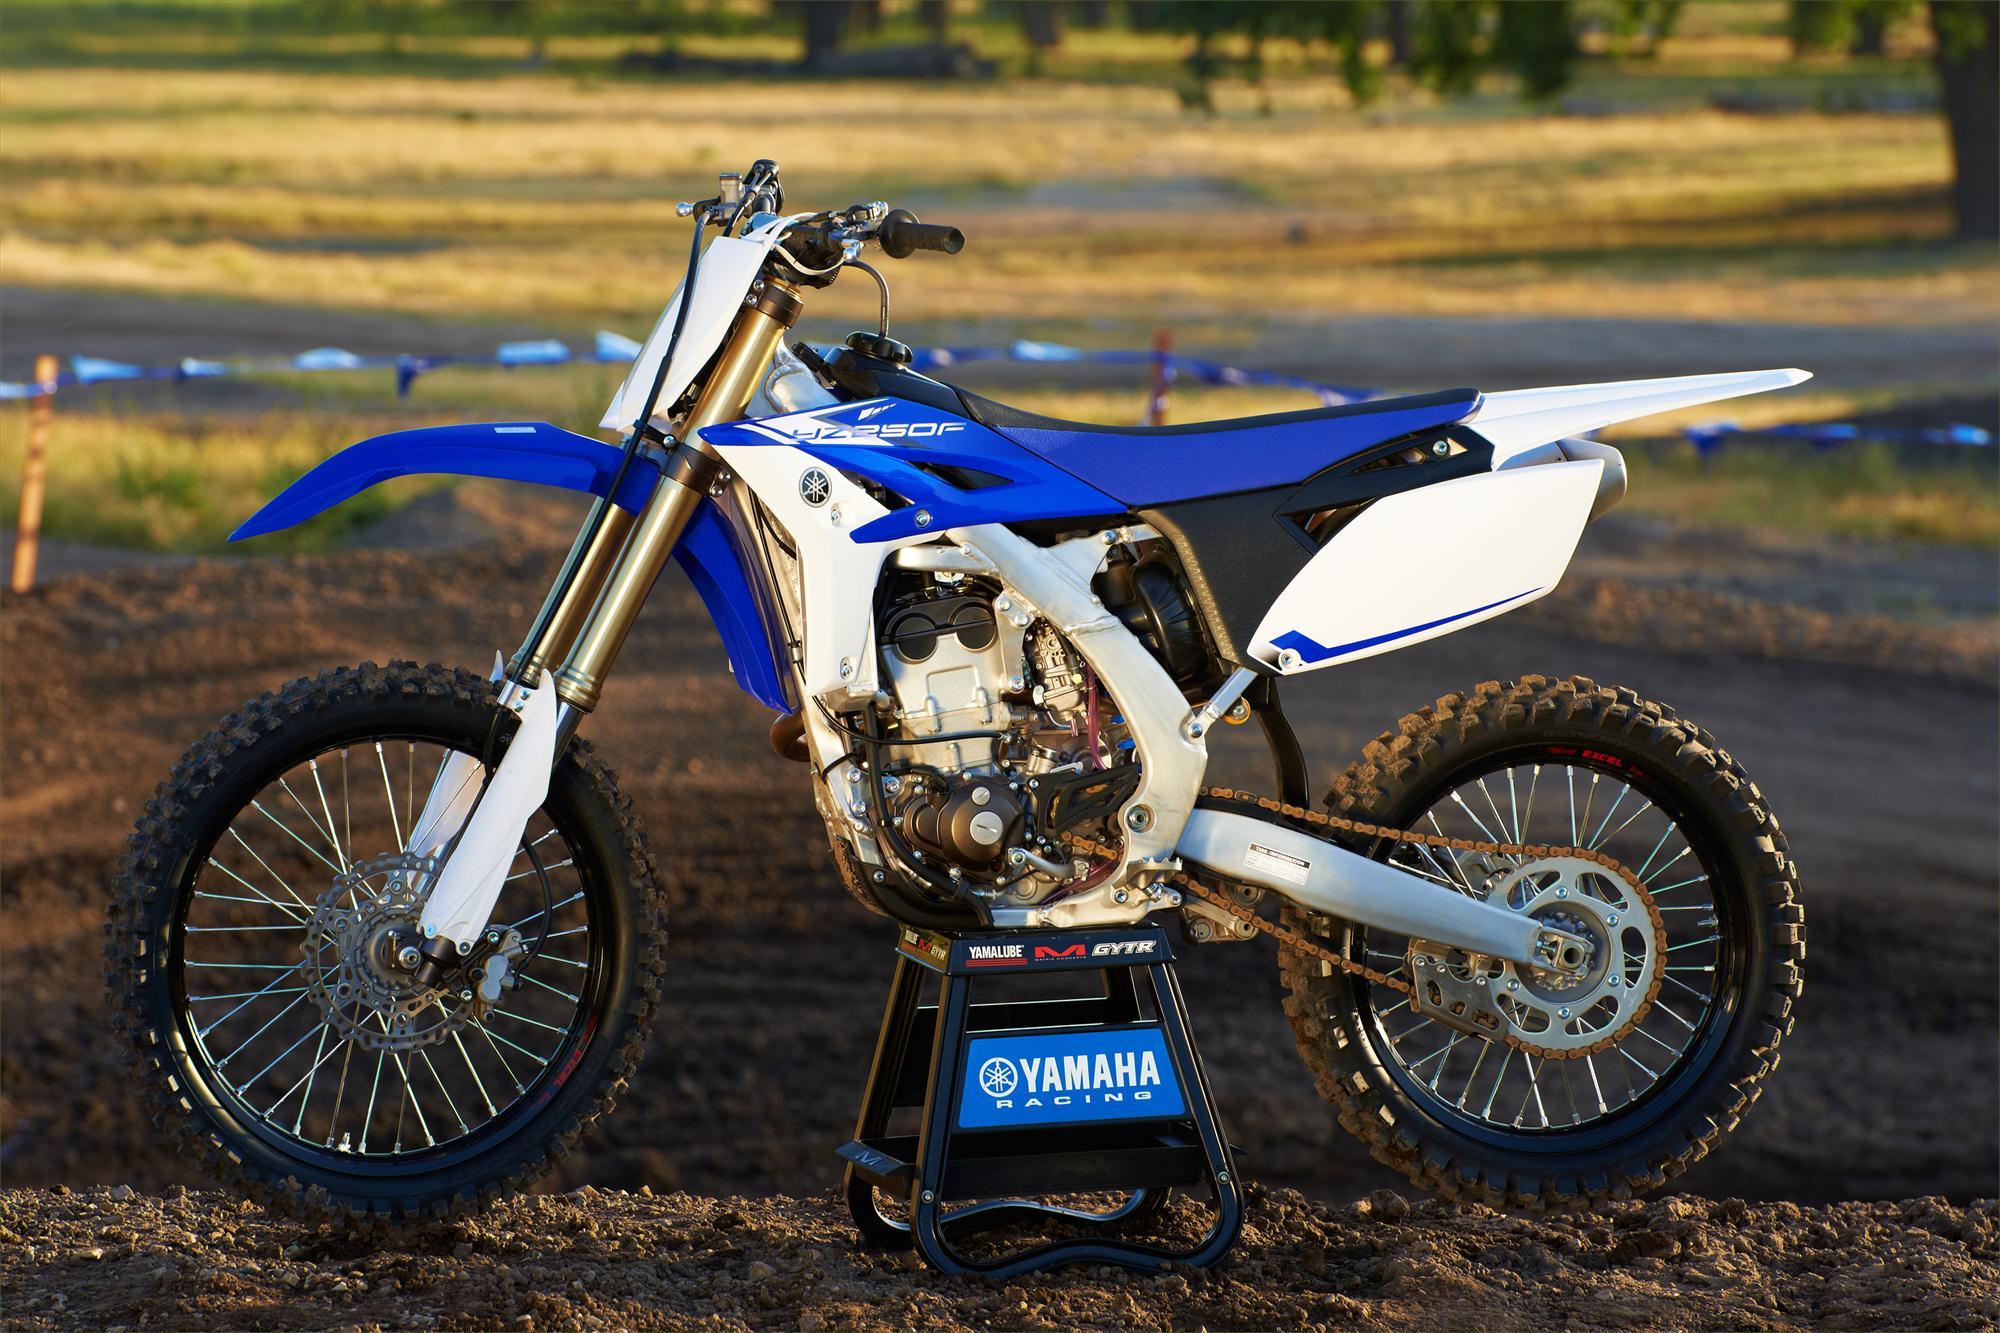 Мотоцикл Yamaha YZ250 2013 характеристики, фотографии